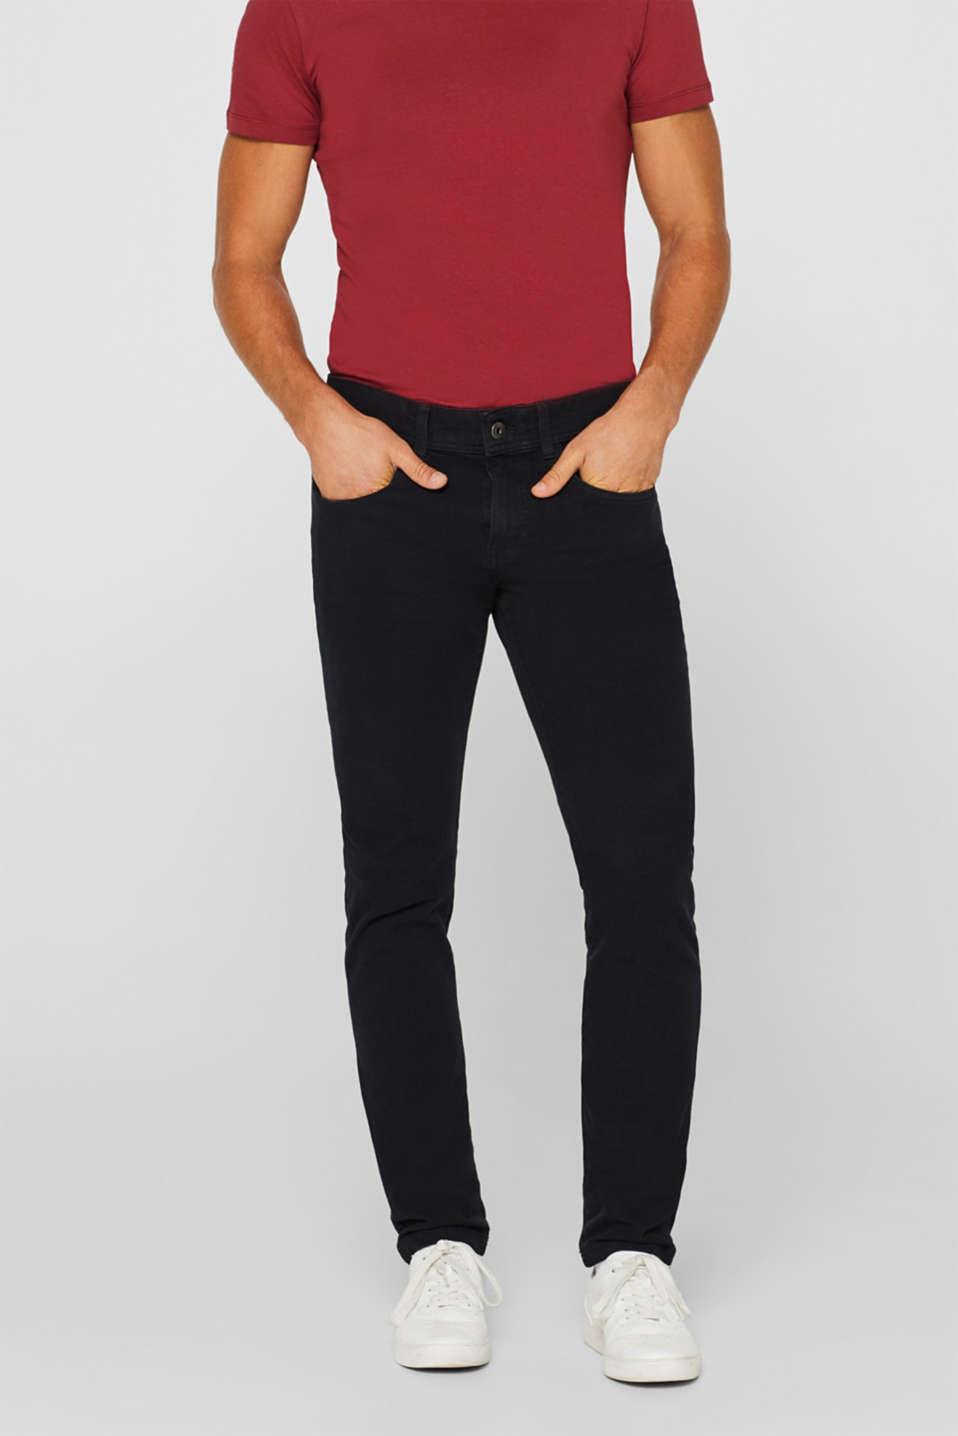 Pants woven Slim fit, BLACK, detail image number 0